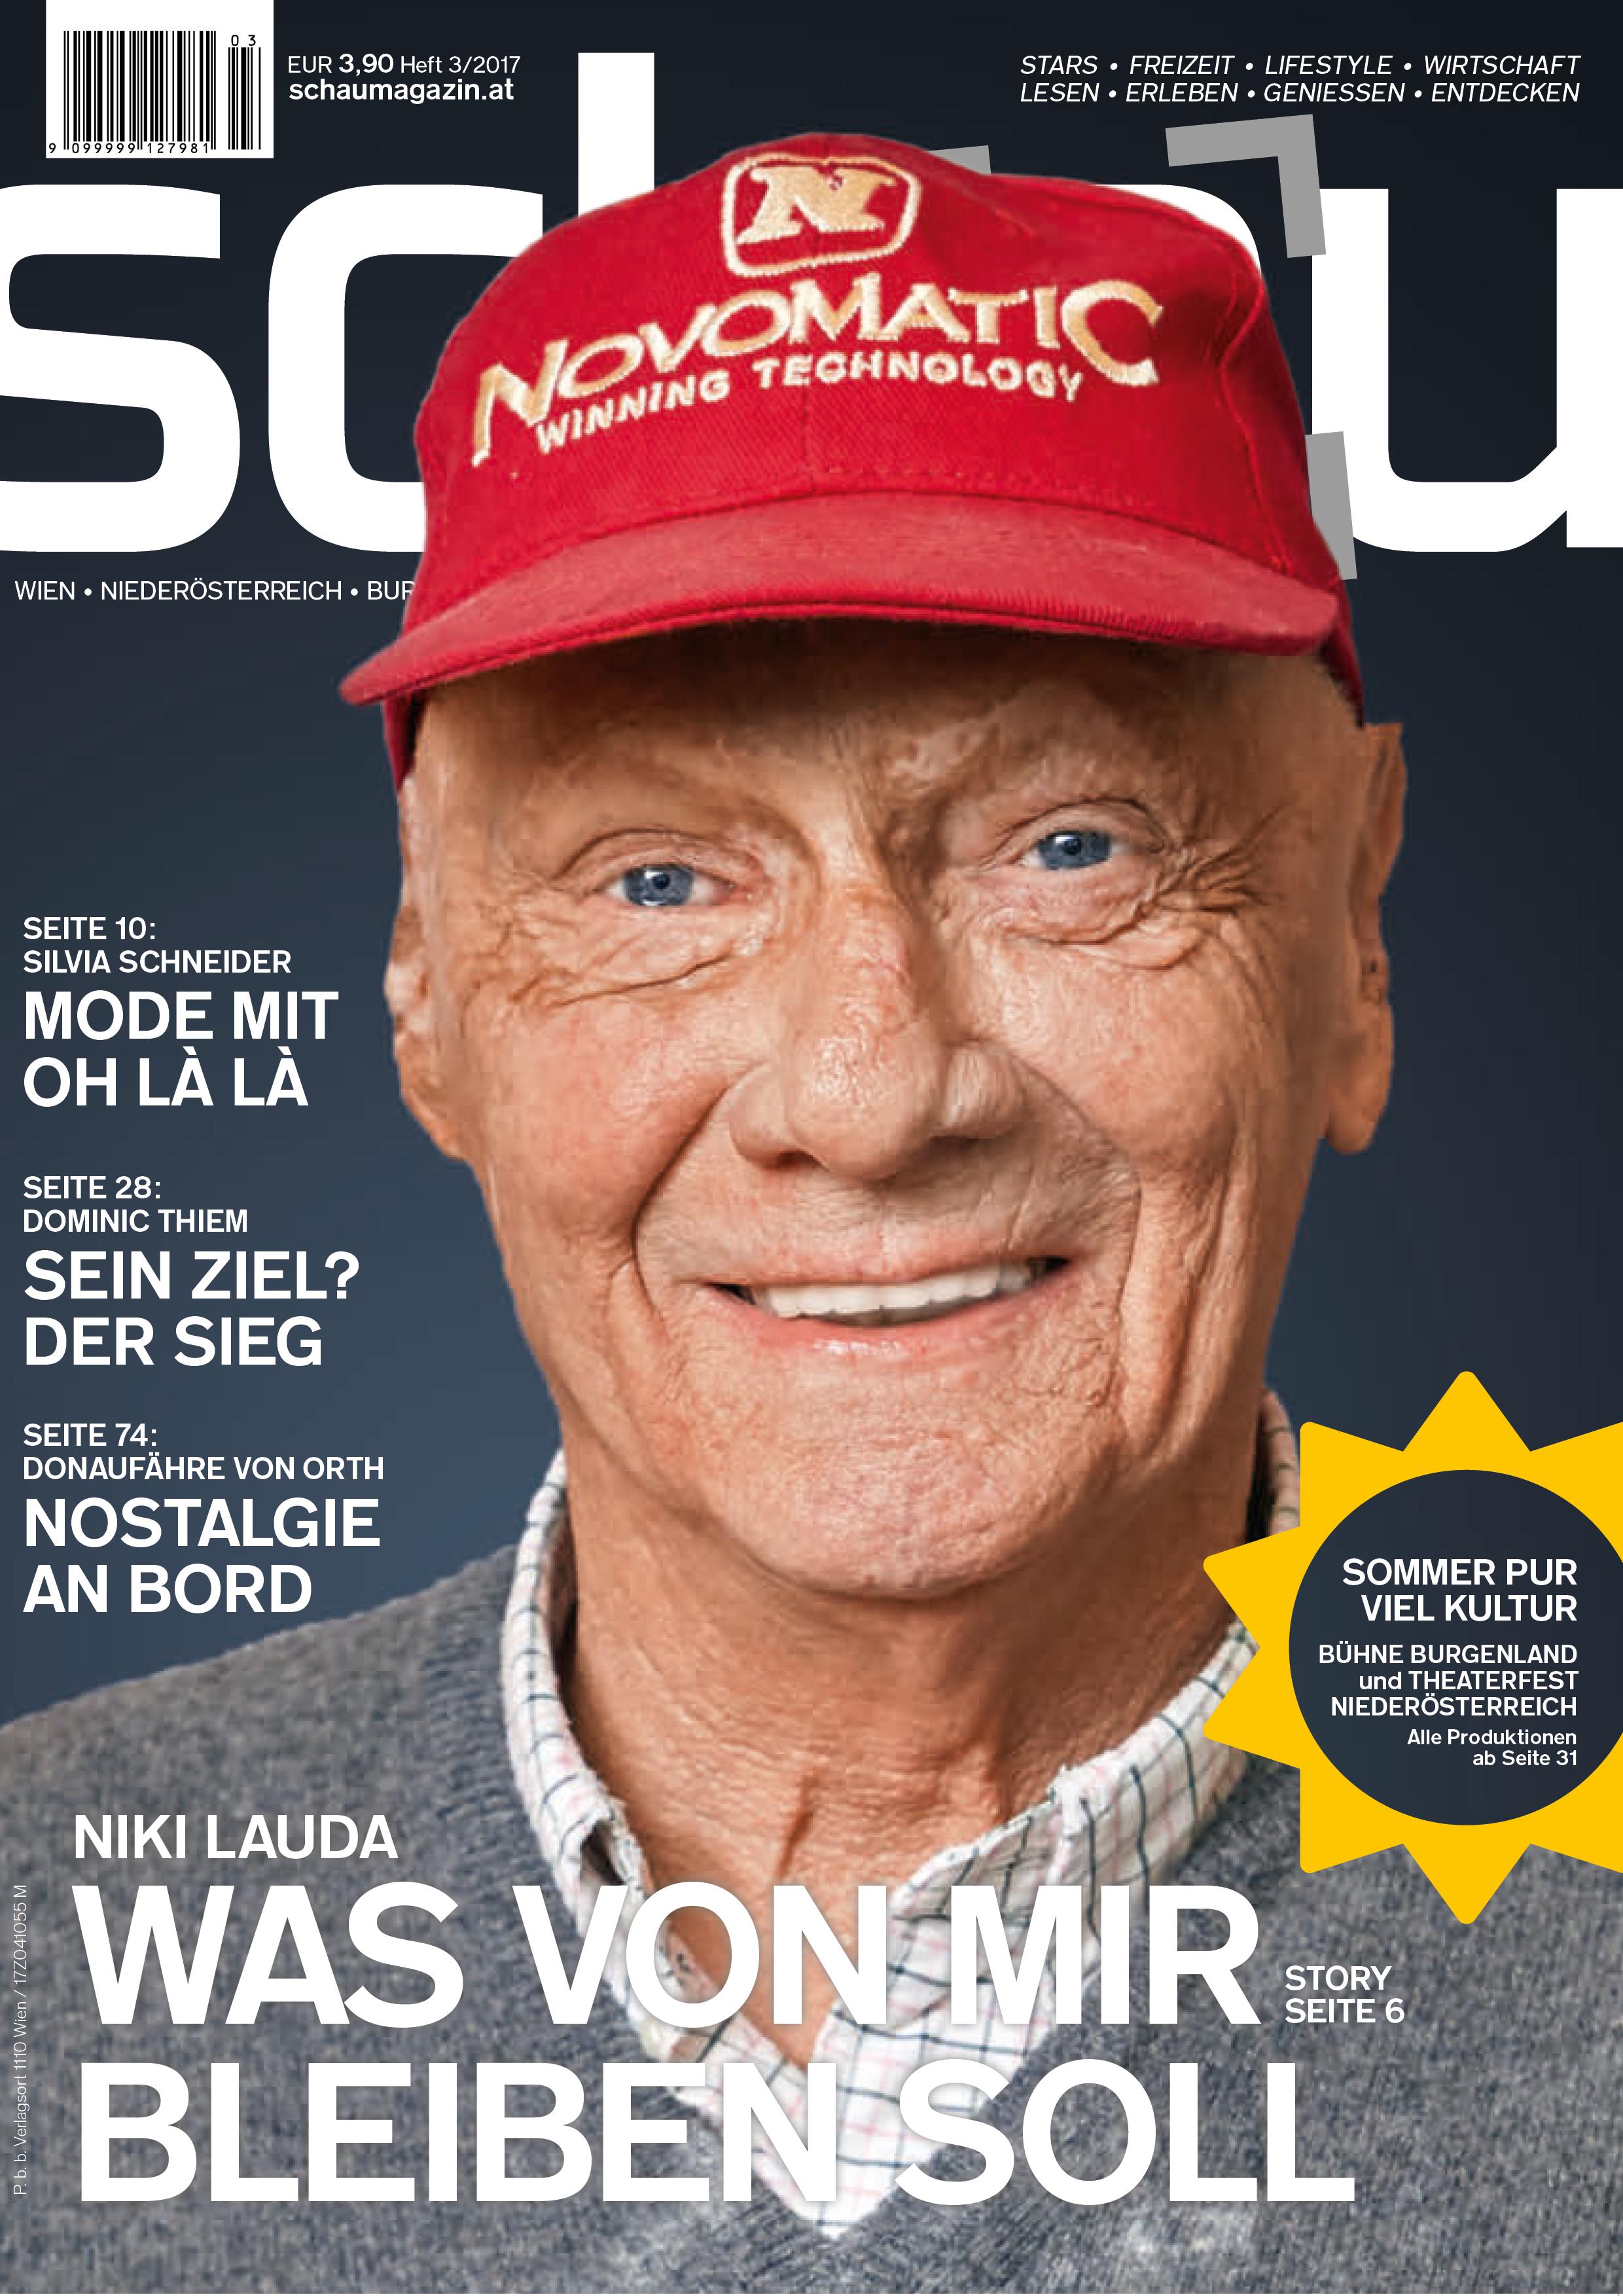 NUSSYY® im SCHAU Magazin COVER